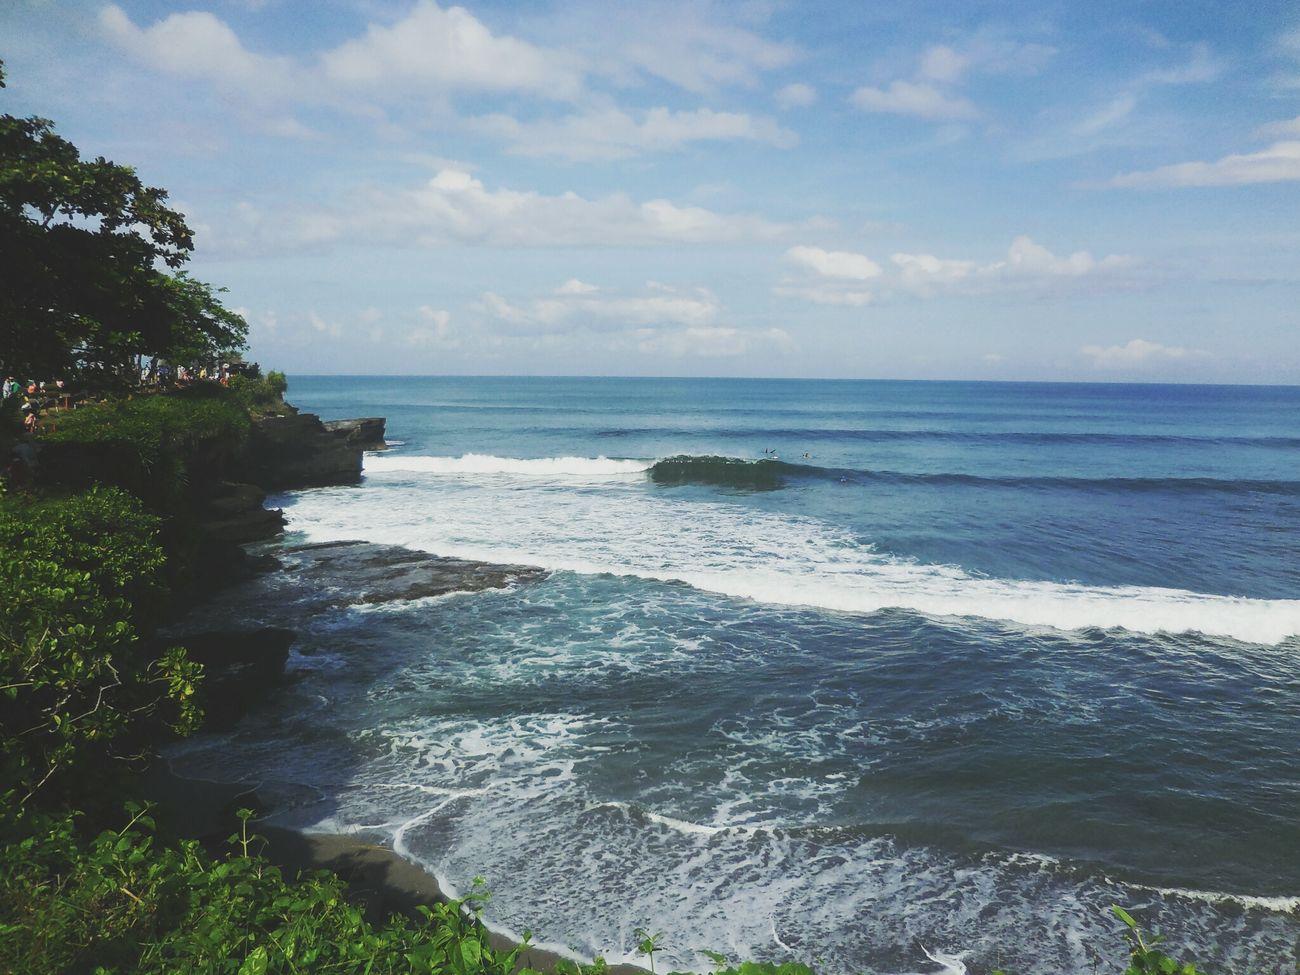 Ocean breeze 💕💕 Ocean View Ocean Ocean❤ Tanahlot Tanahlot, Bali, Indonesia Beachphotography